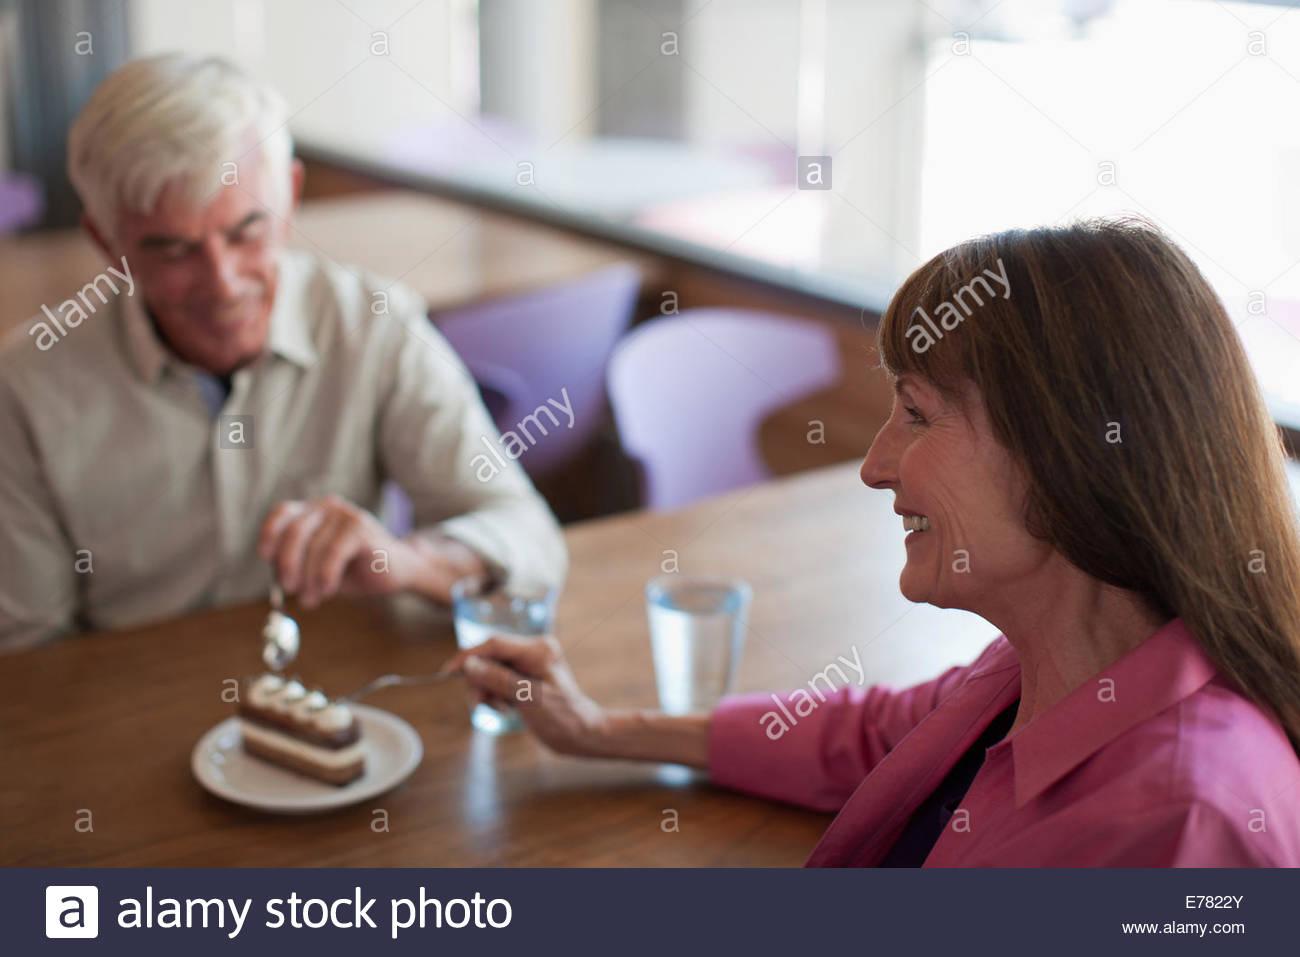 Older couple sharing dessert in cafe - Stock Image